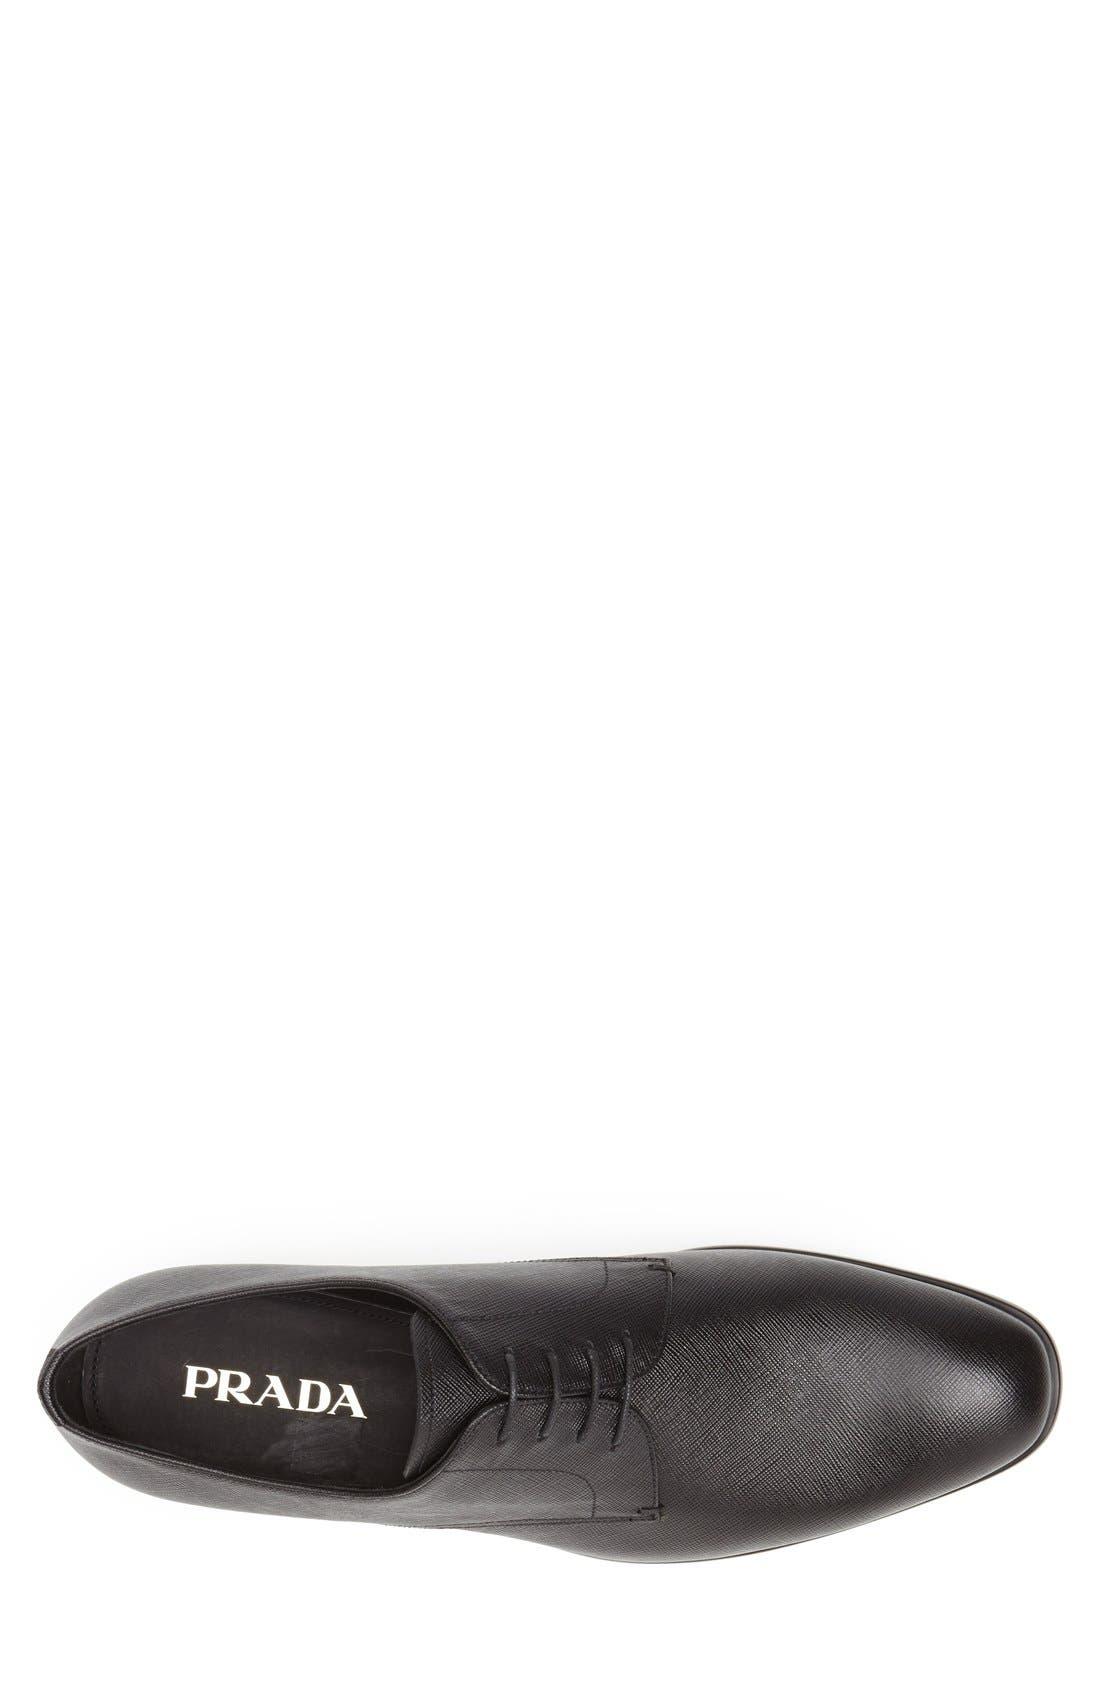 PRADA, Plain Toe Derby, Alternate thumbnail 3, color, BLACK